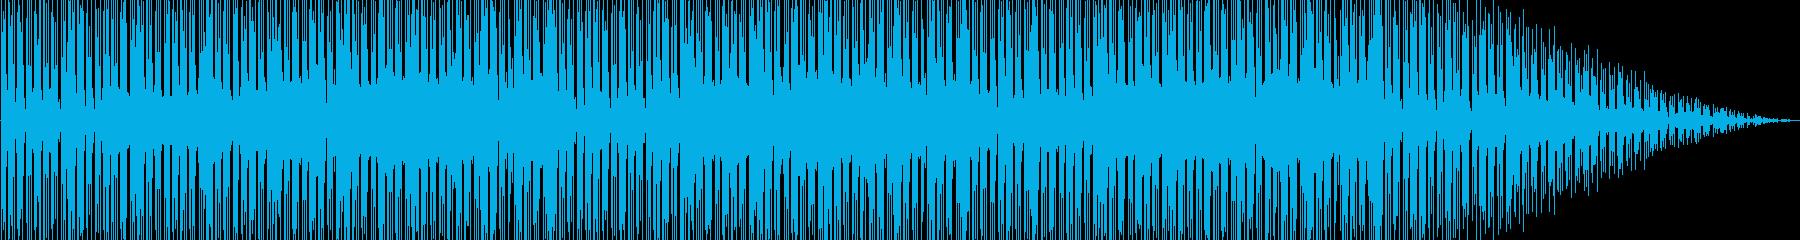 ED向けインパクトありなchillの再生済みの波形